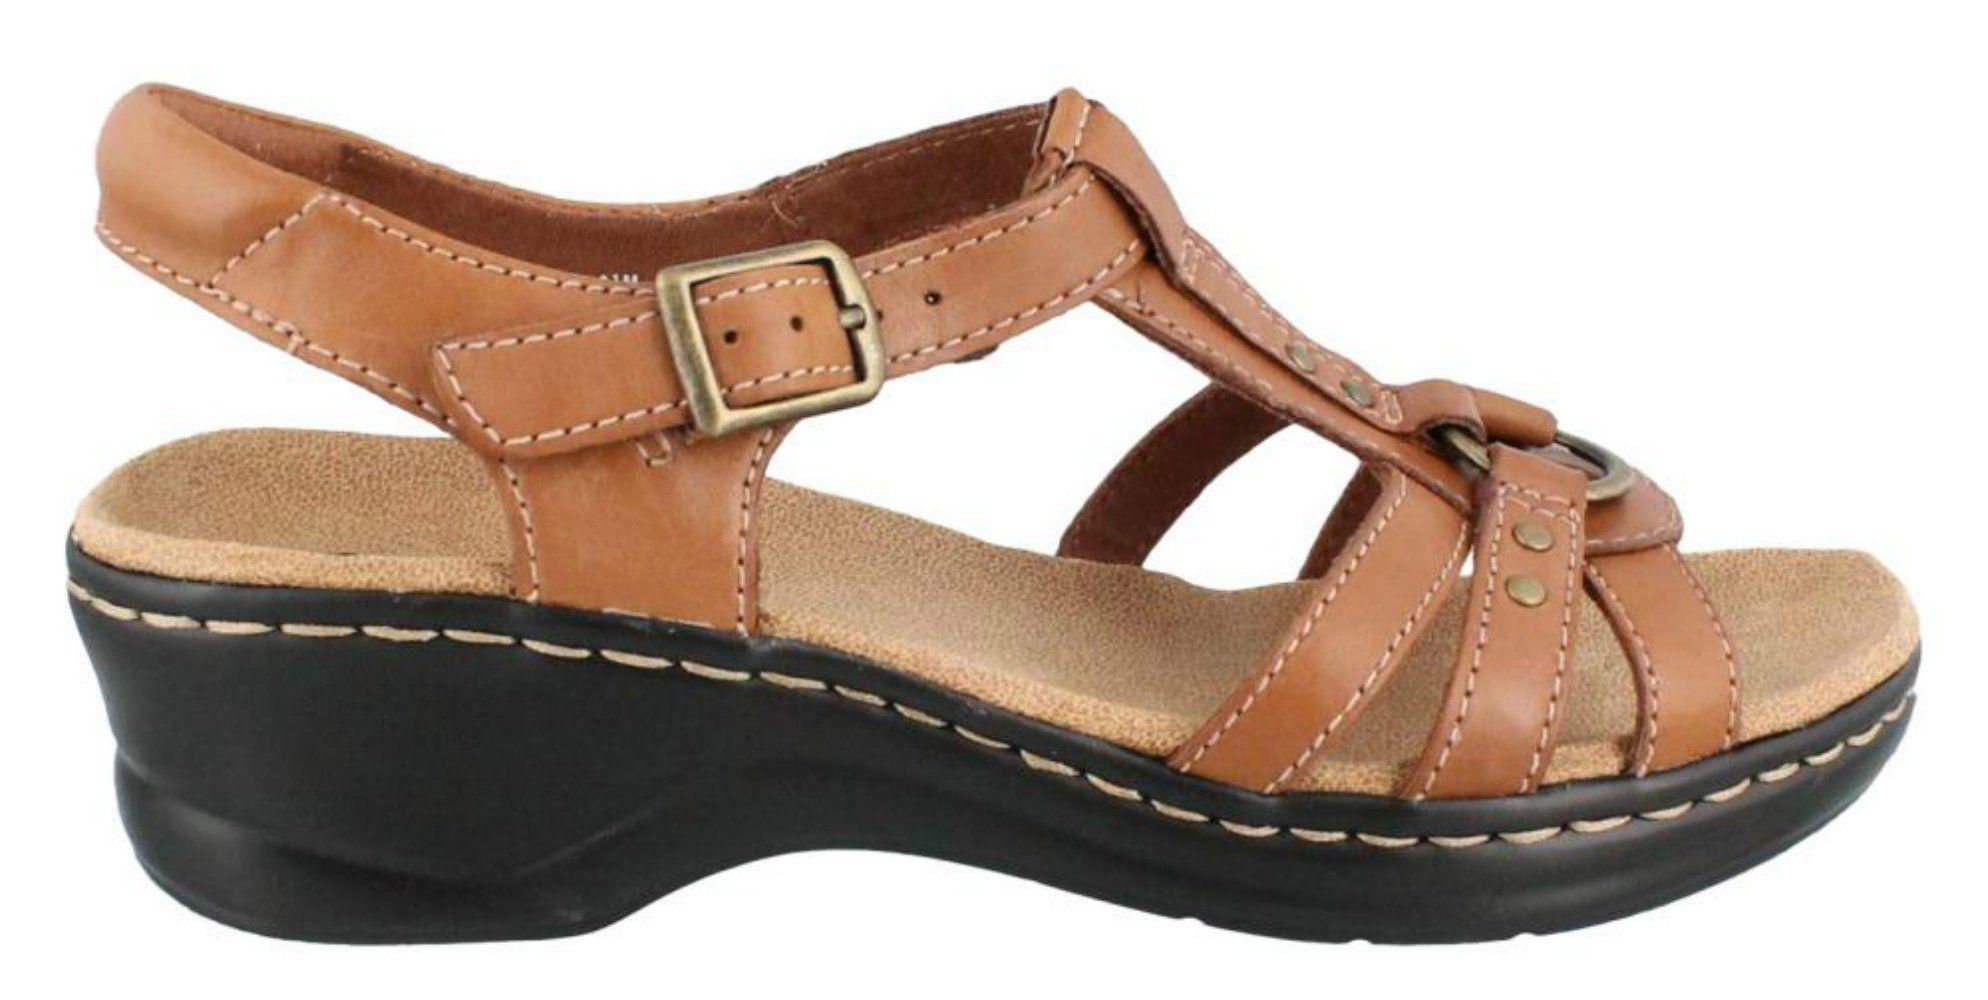 Clarks Women's Lexi Sumac Wedge Sandal,Tan,10 M US. Soft leather.